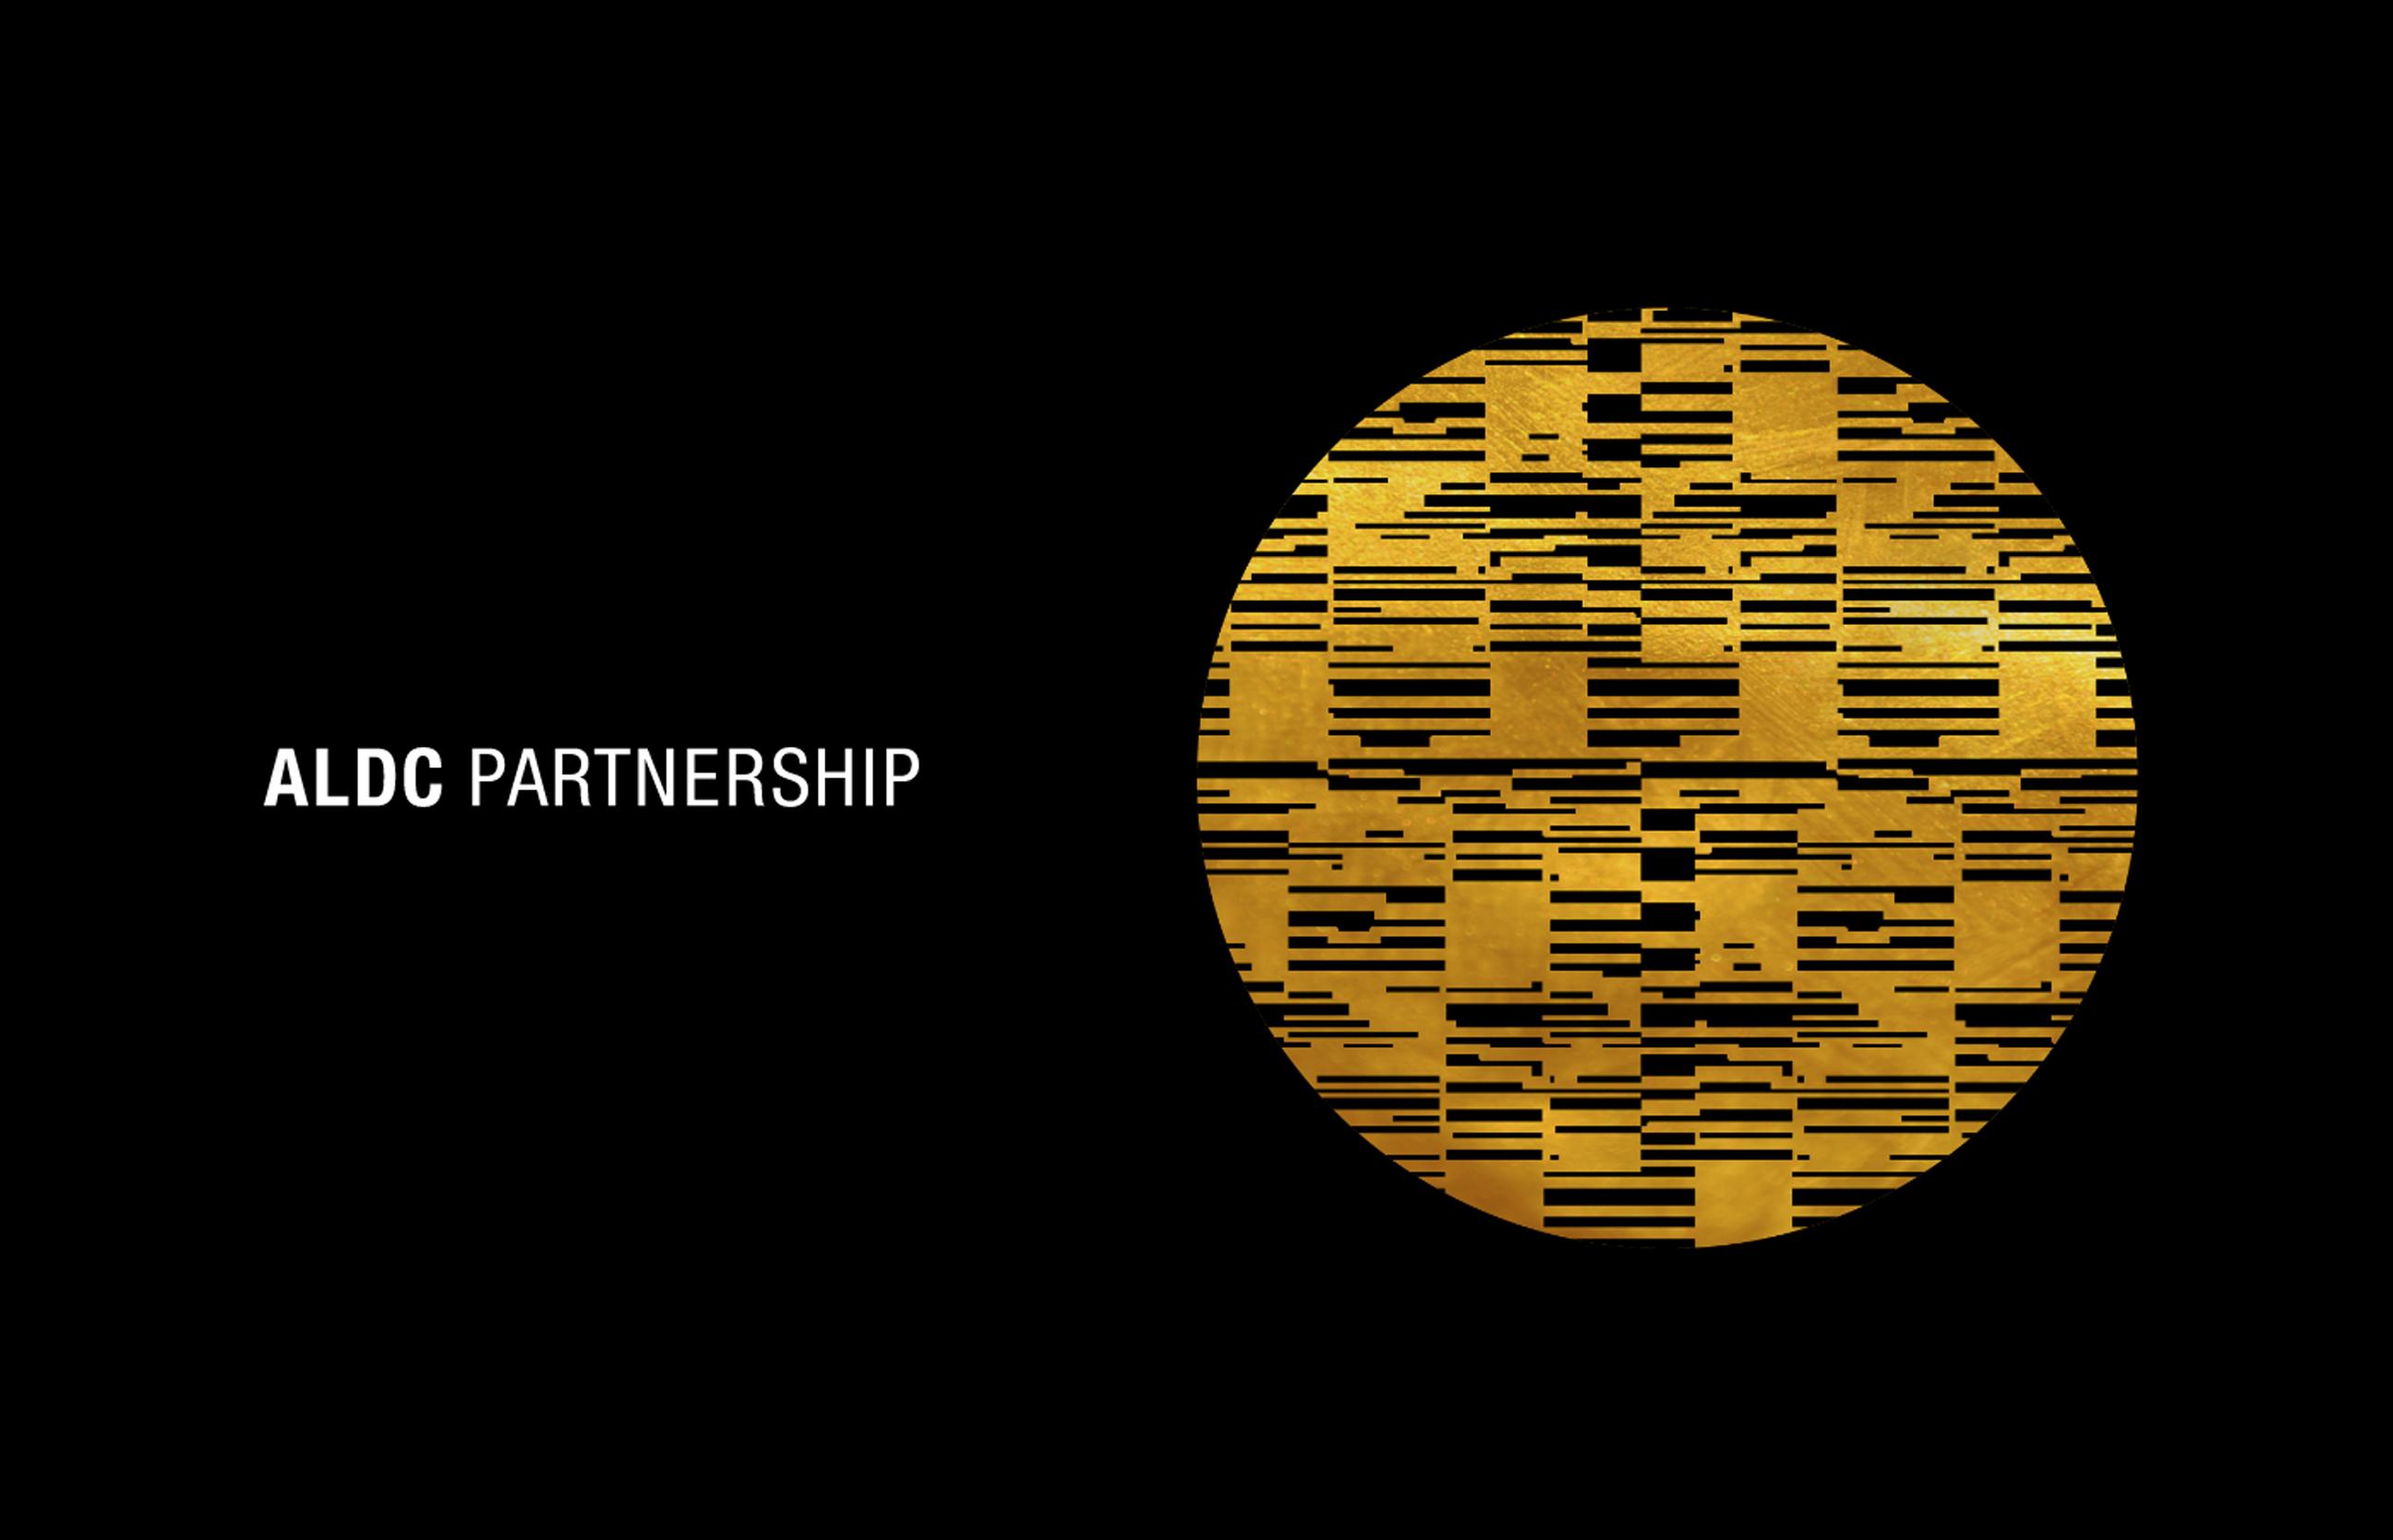 ALDC Partnership